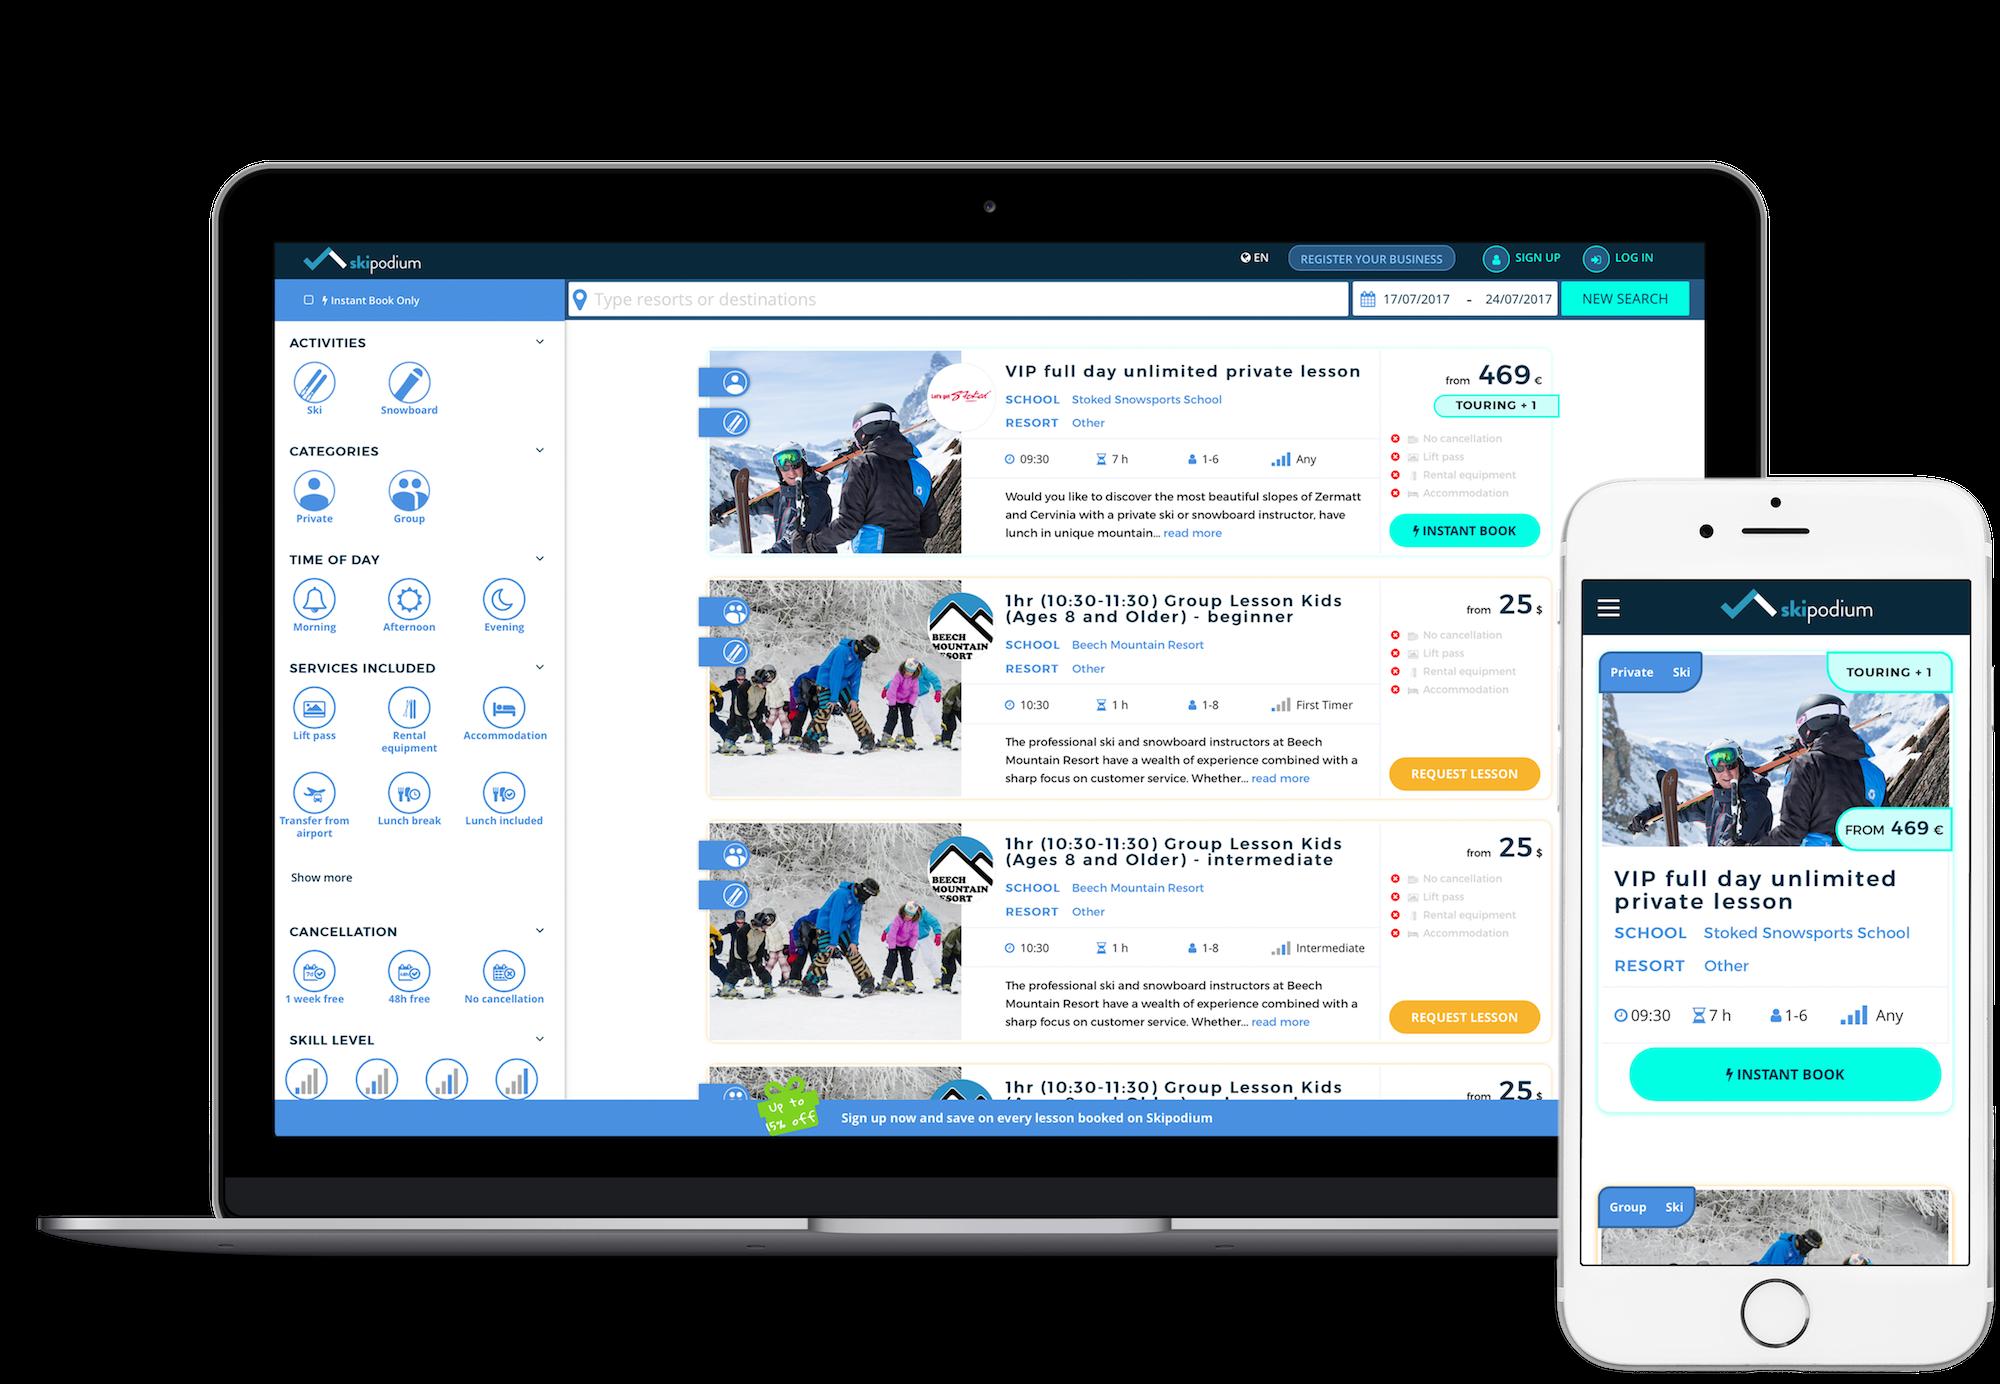 Skipodium, Mac, iPhone, book online, ski lessons, snowsports